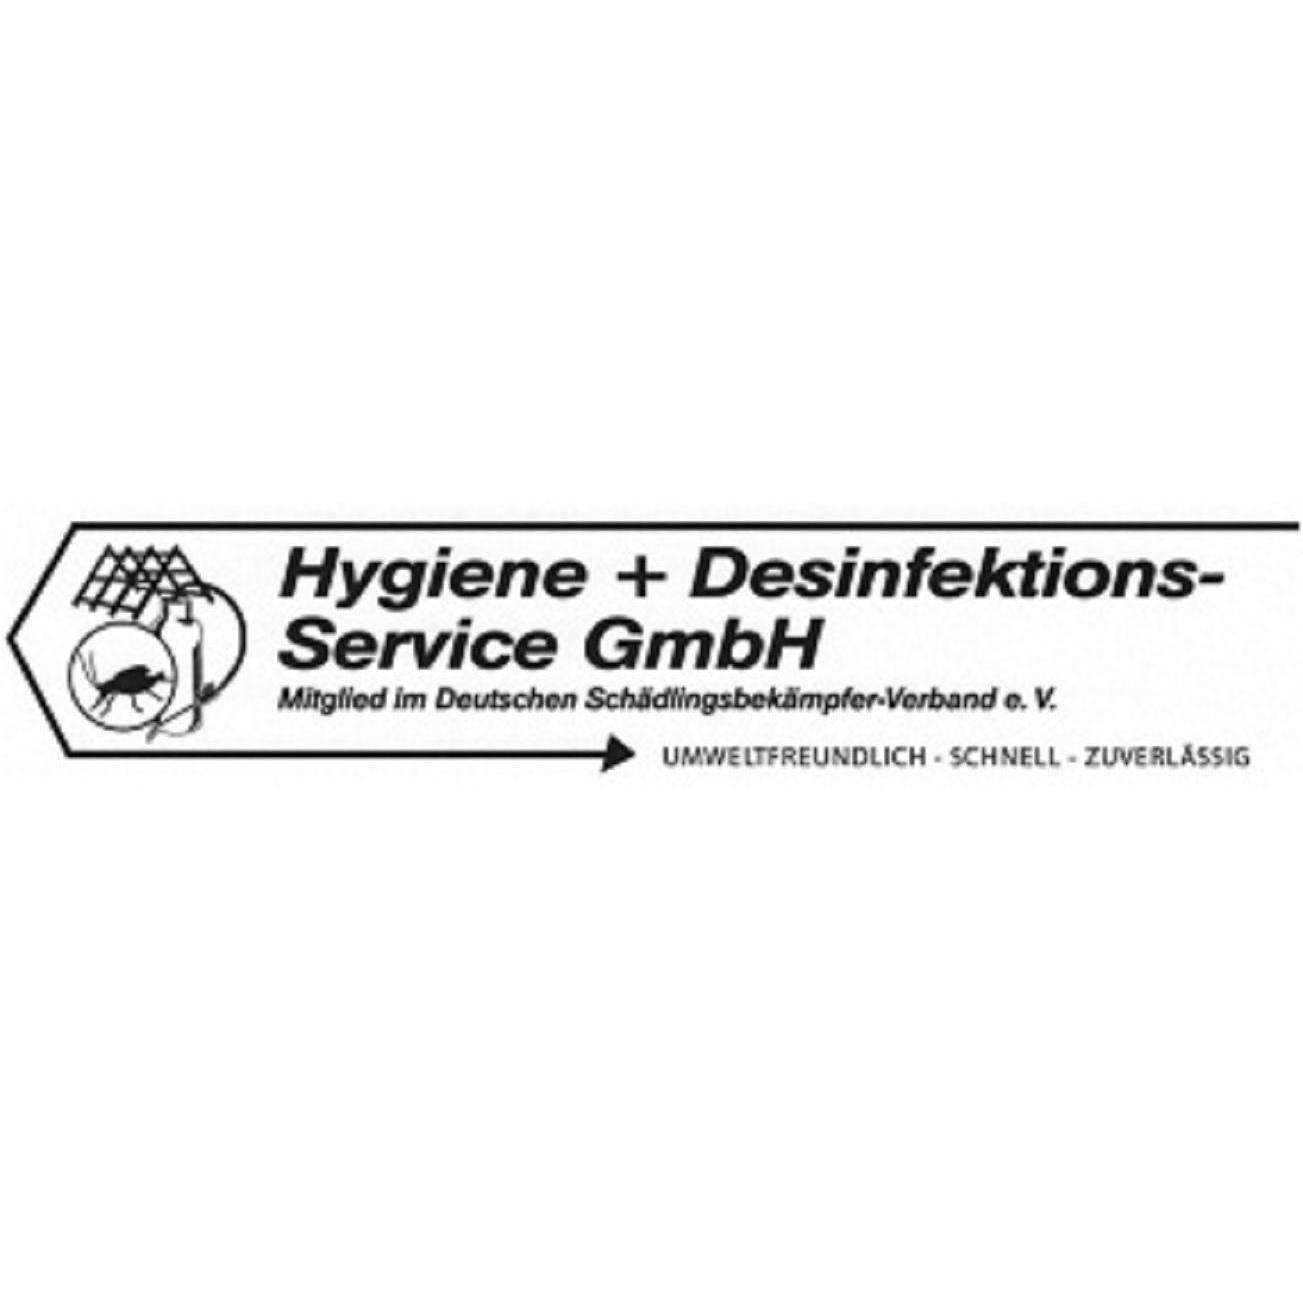 Hygiene- & Desinfektions Service GmbH